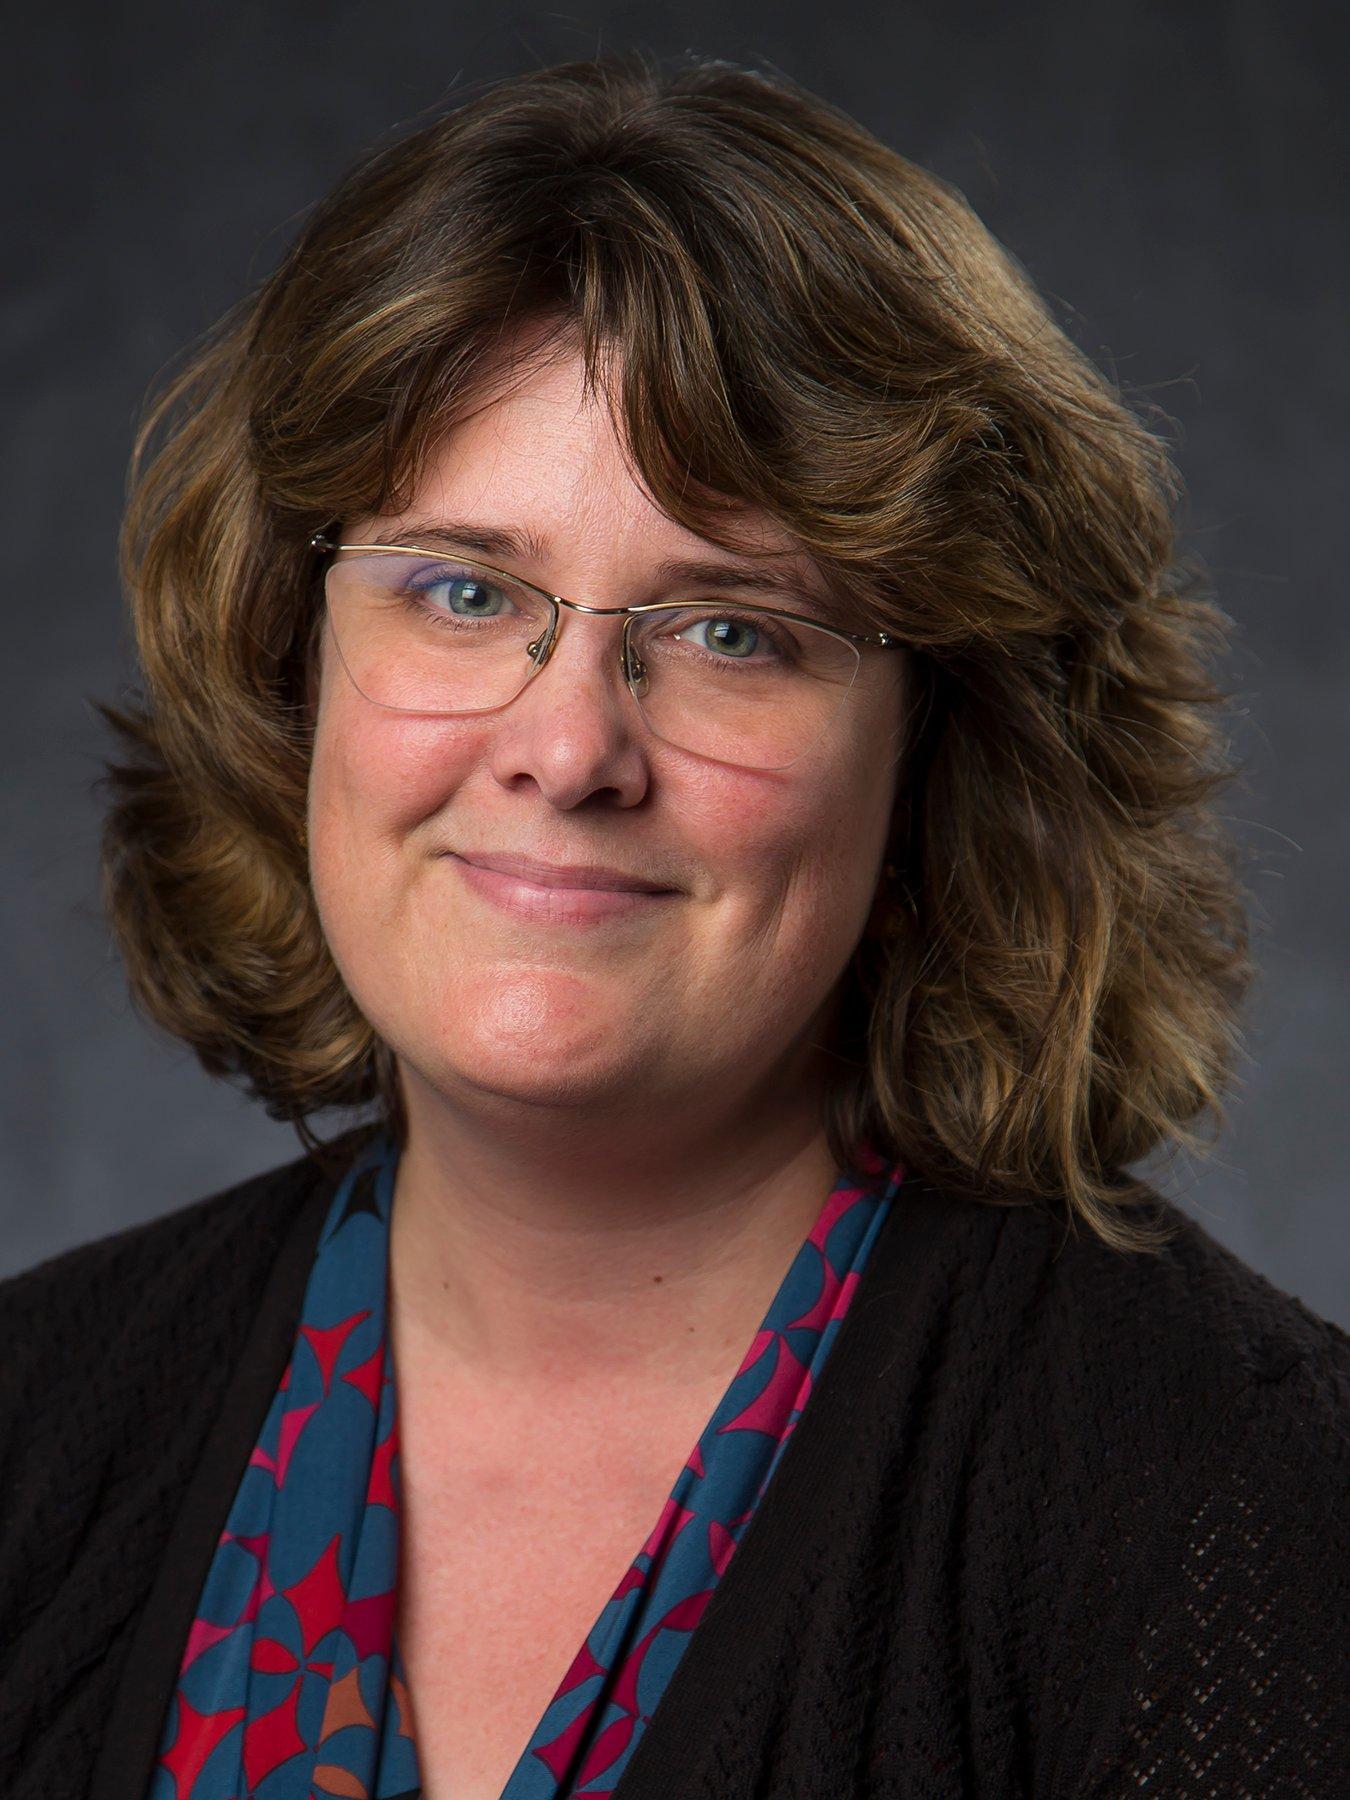 Sarah Hallen, MD